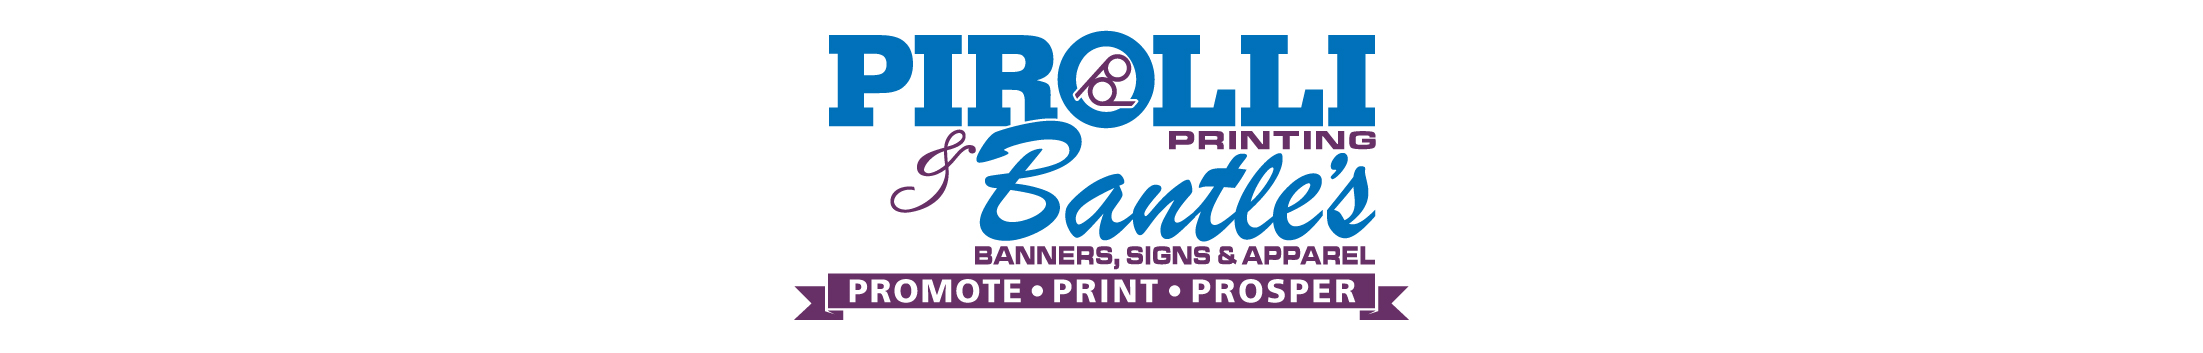 Pirolli Printing